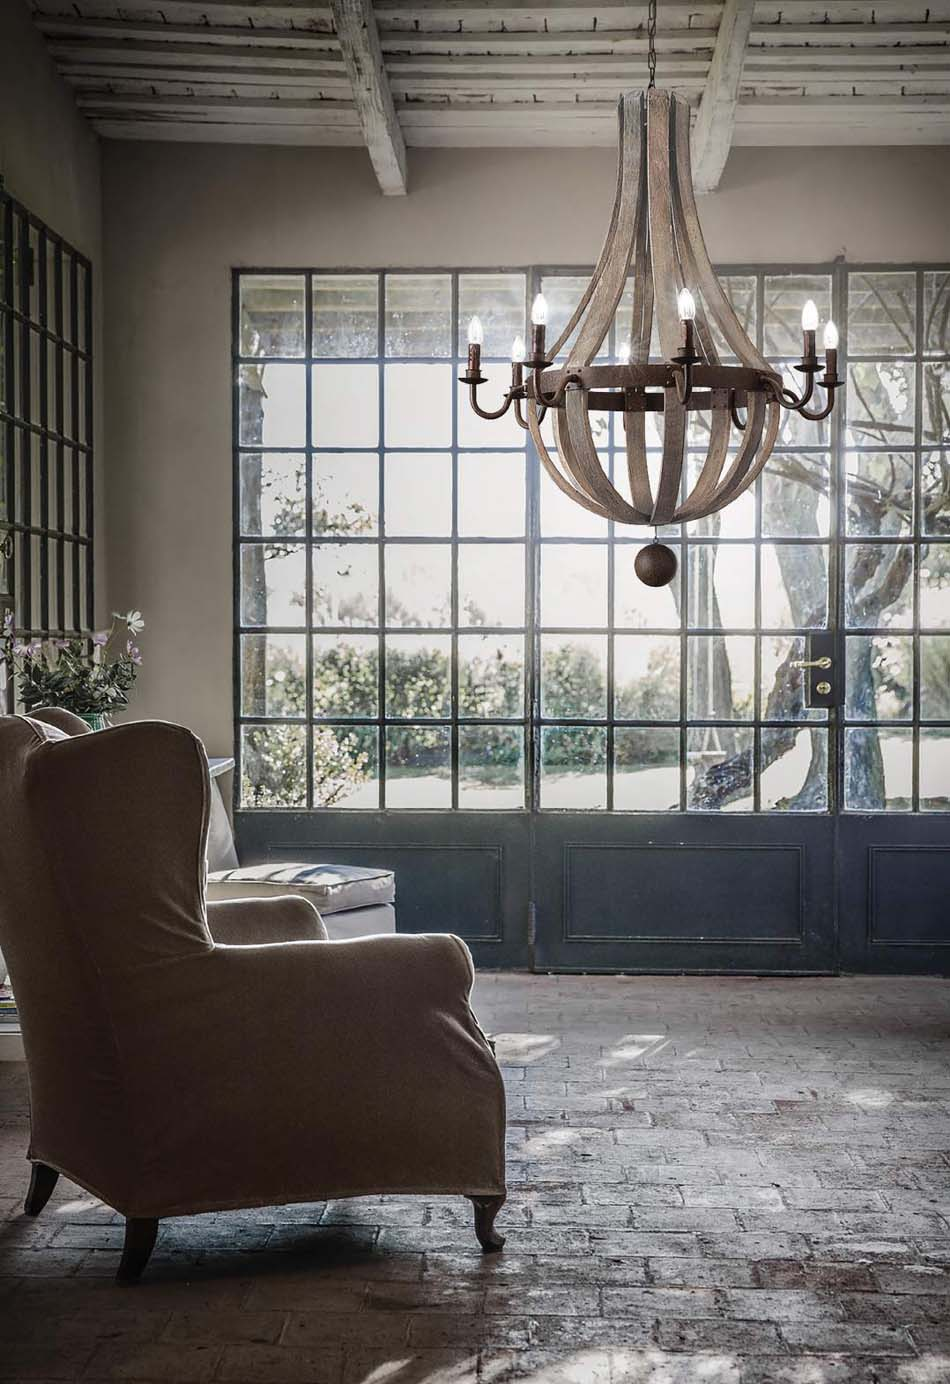 Lampade 65 sospese vintage Ideal Lux Millennium – Toscana Arredamenti